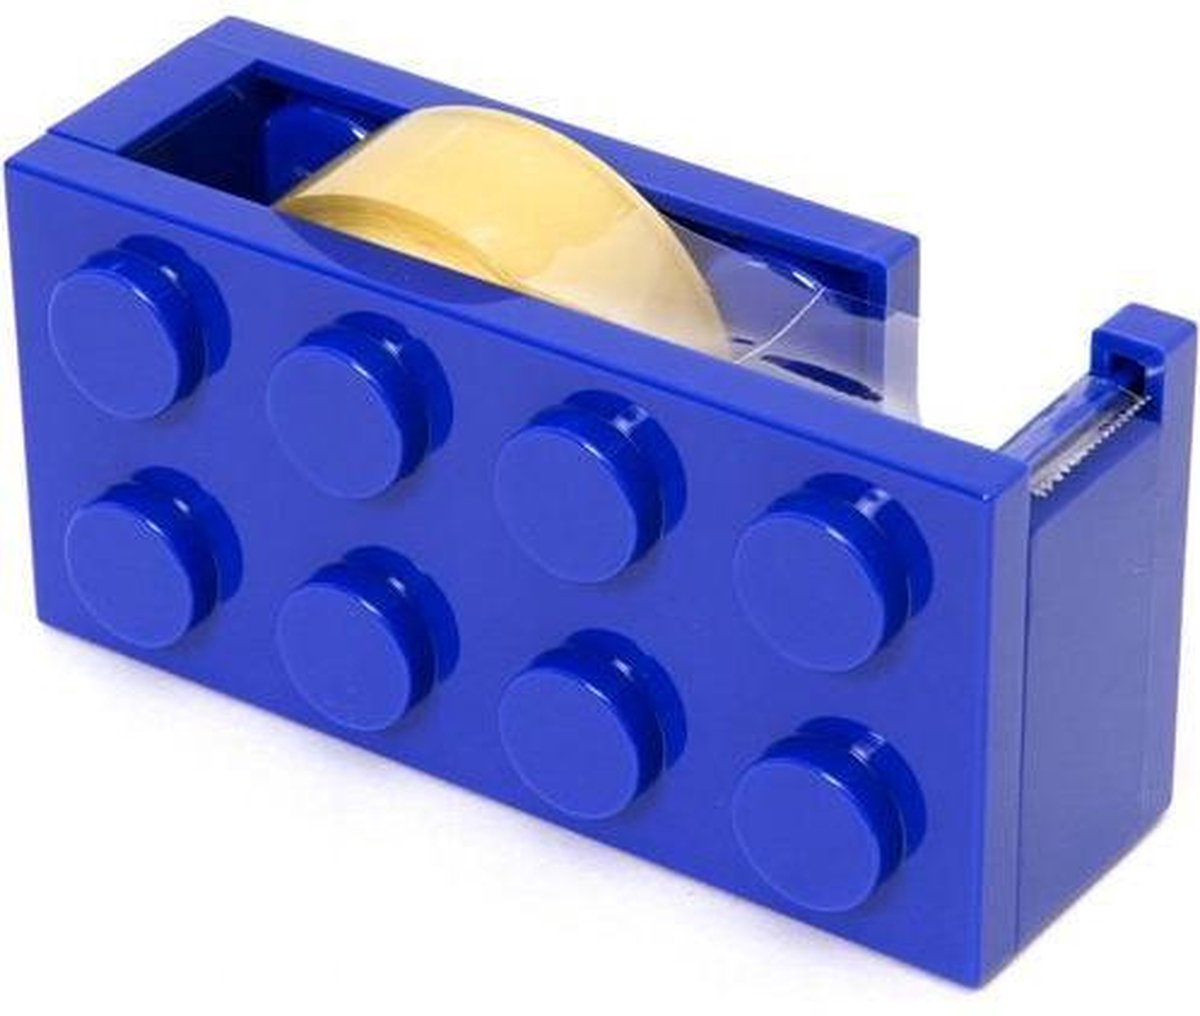 Lego blok plakband dispenser BLAUW bekend van lego - set - blokjes - bouwen - figuur - kinderkamer + plakband rol - technic - city - friends - star wars - creator - ninjago - classic - harry potter lego blokje